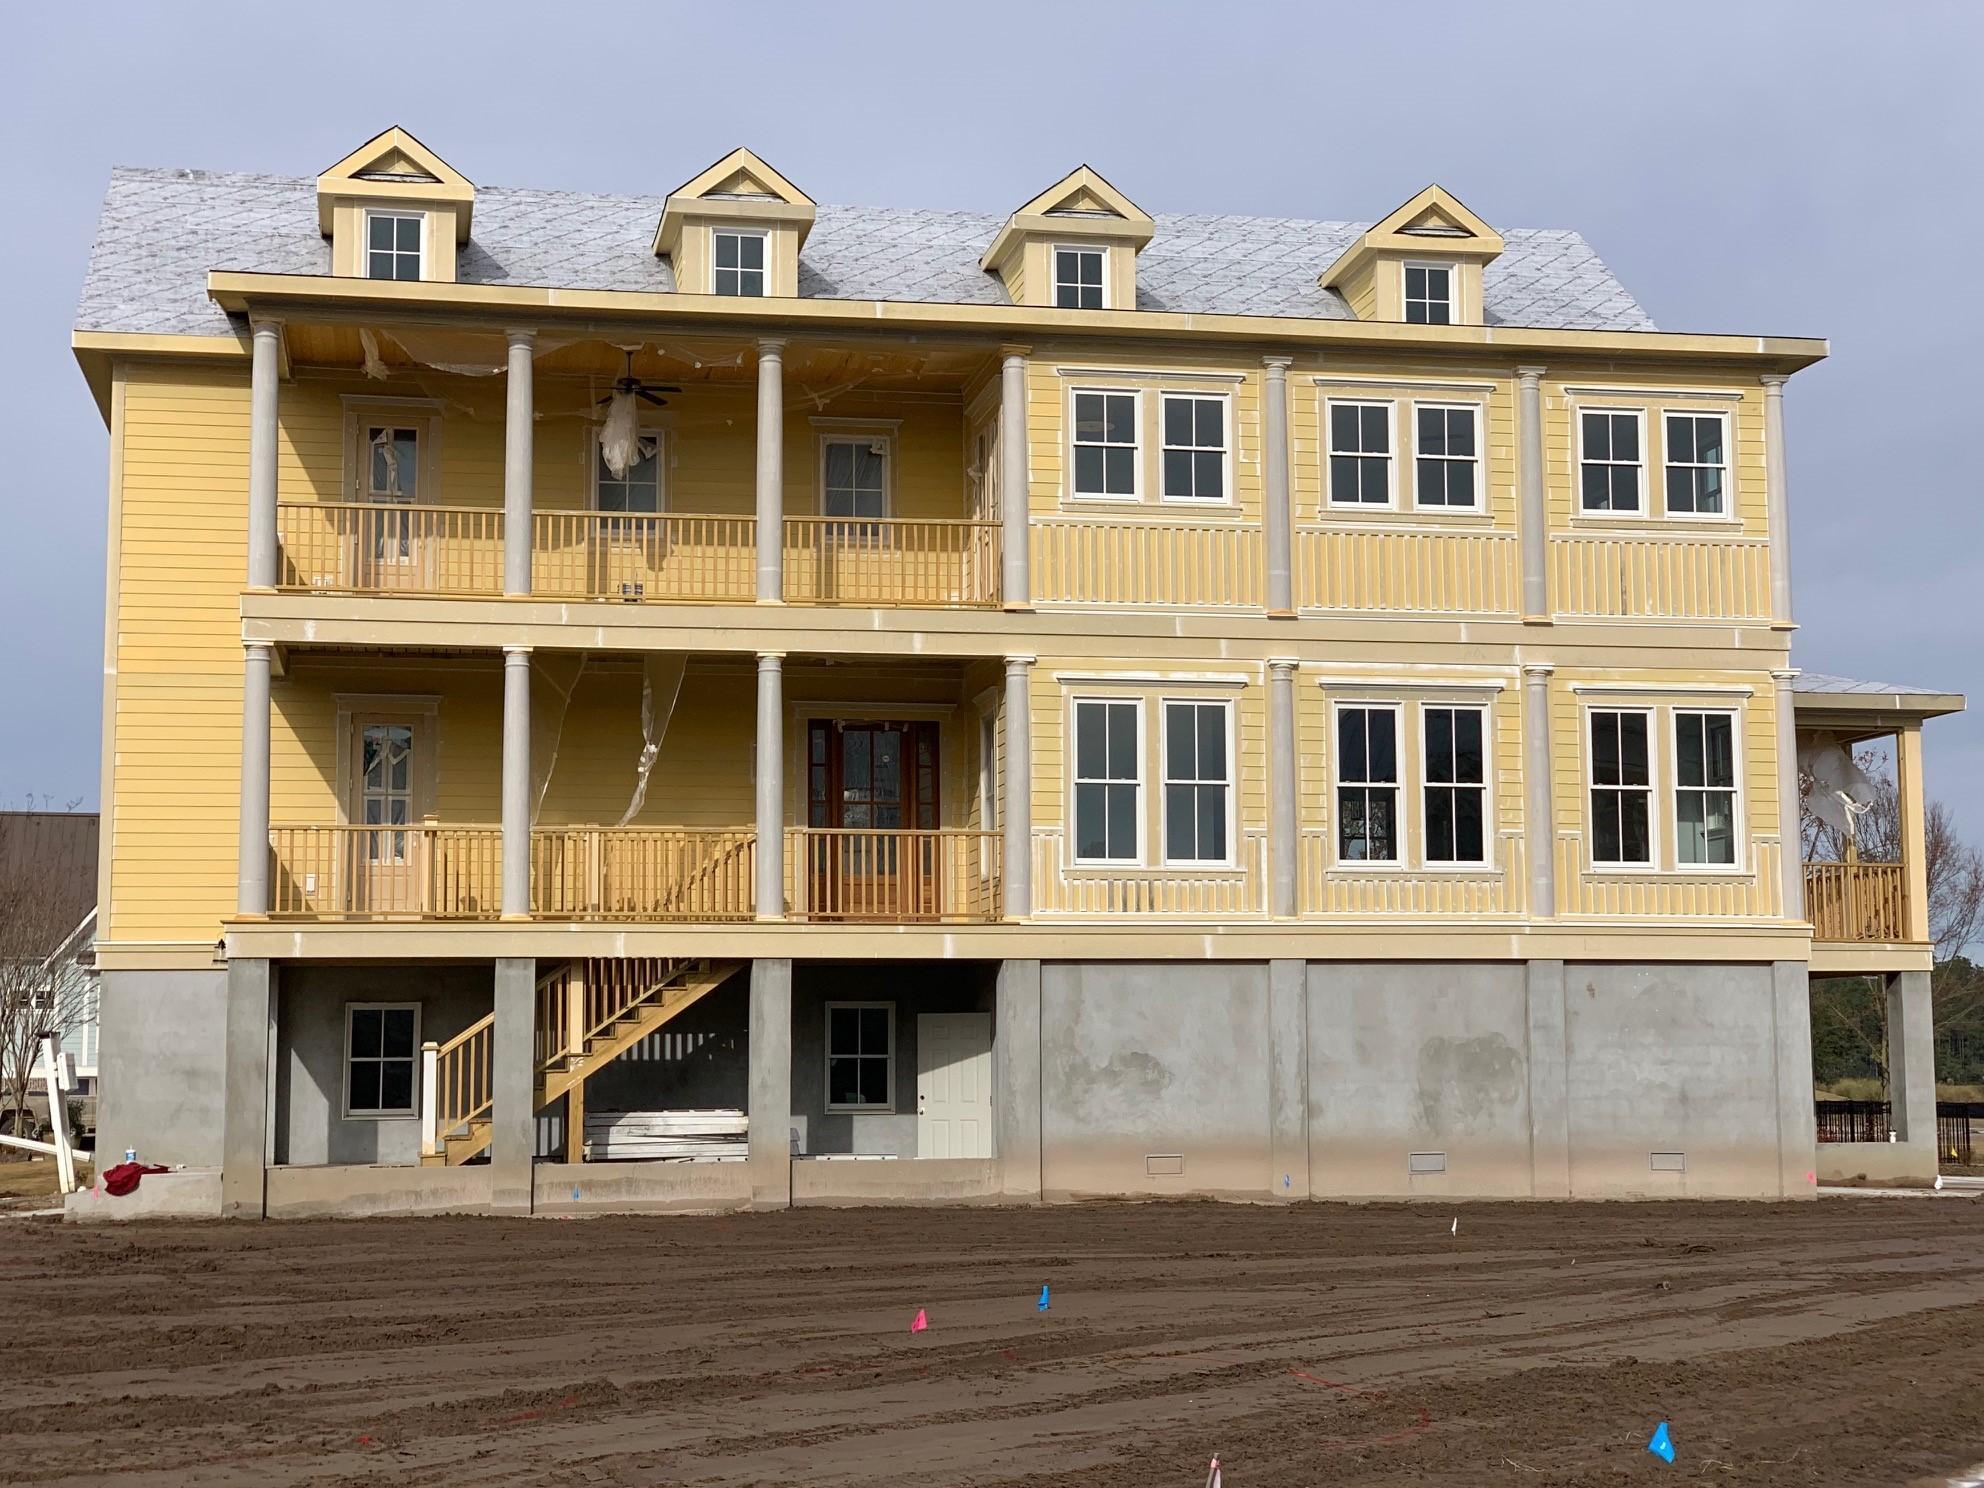 Daniel Island Homes For Sale - 206 Foundry, Charleston, SC - 2